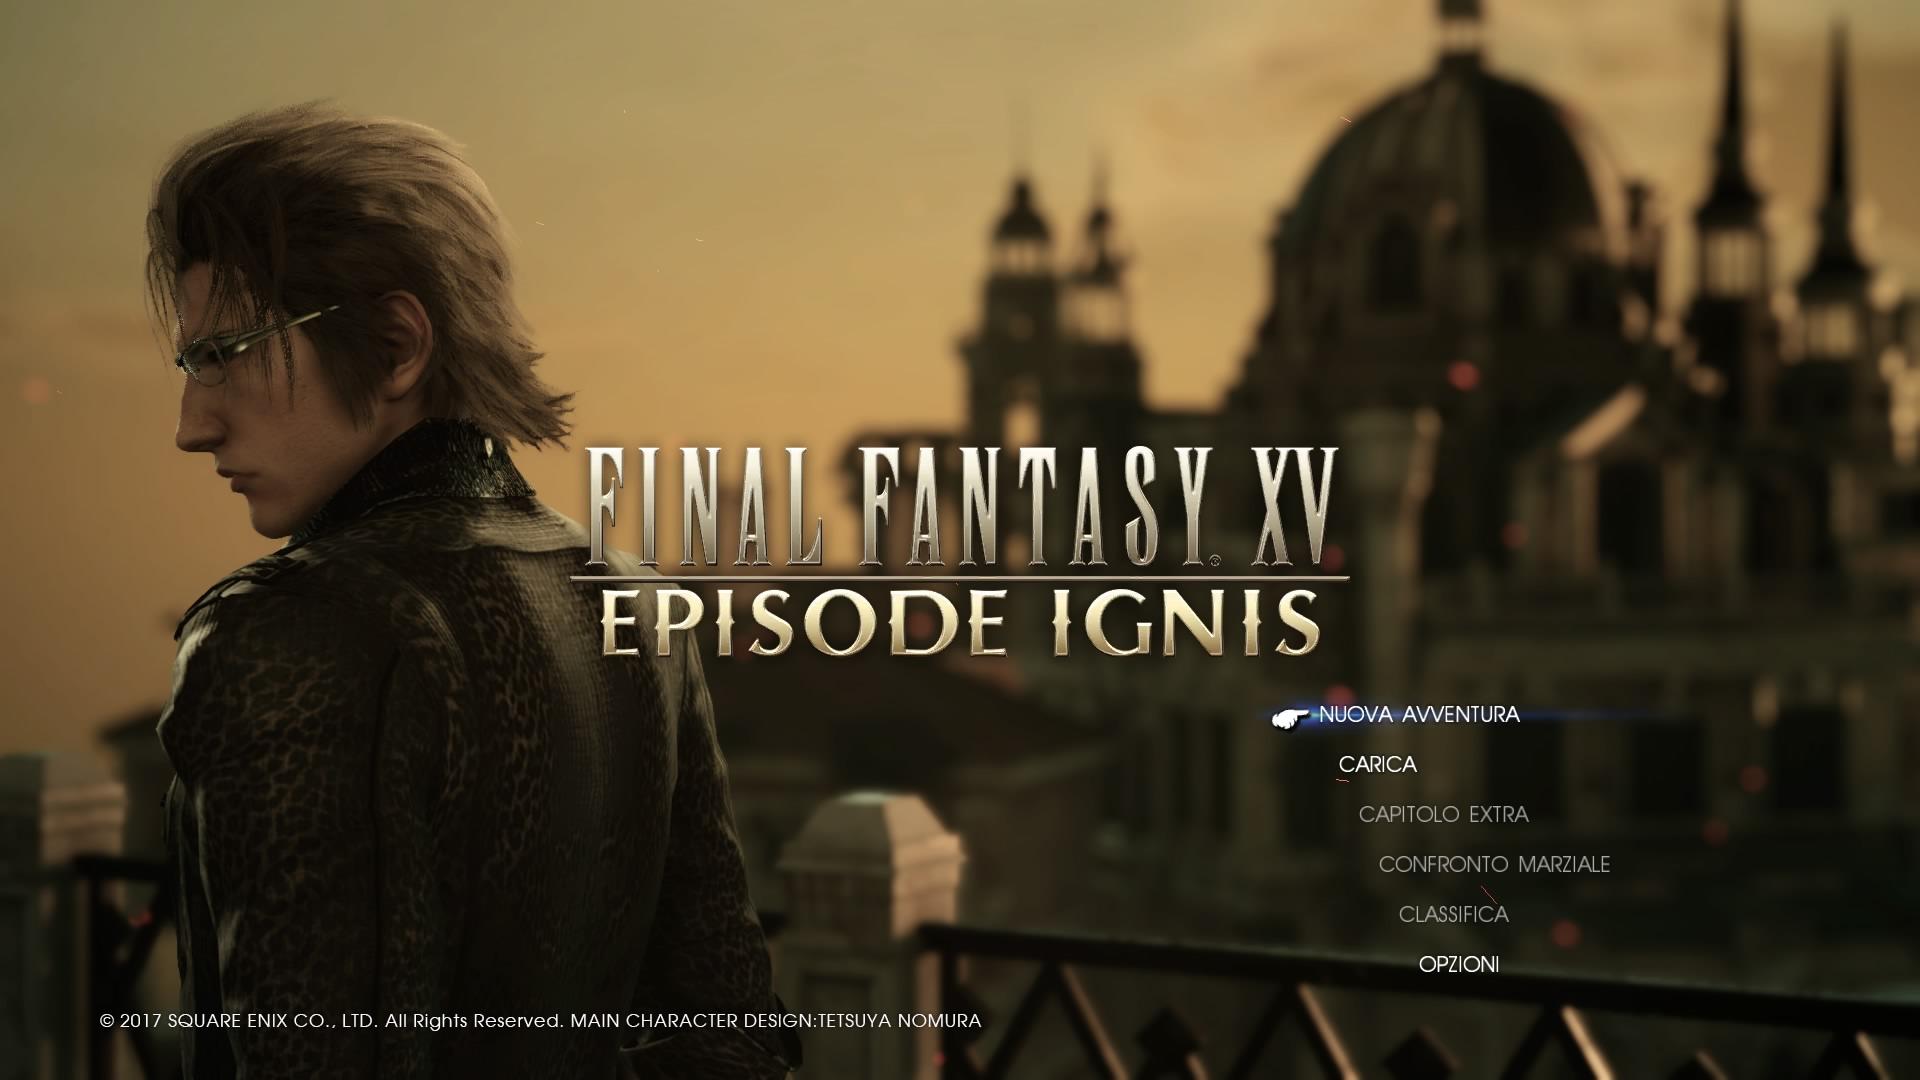 Guida ai Trofei di FFXV: Episode Ignis!